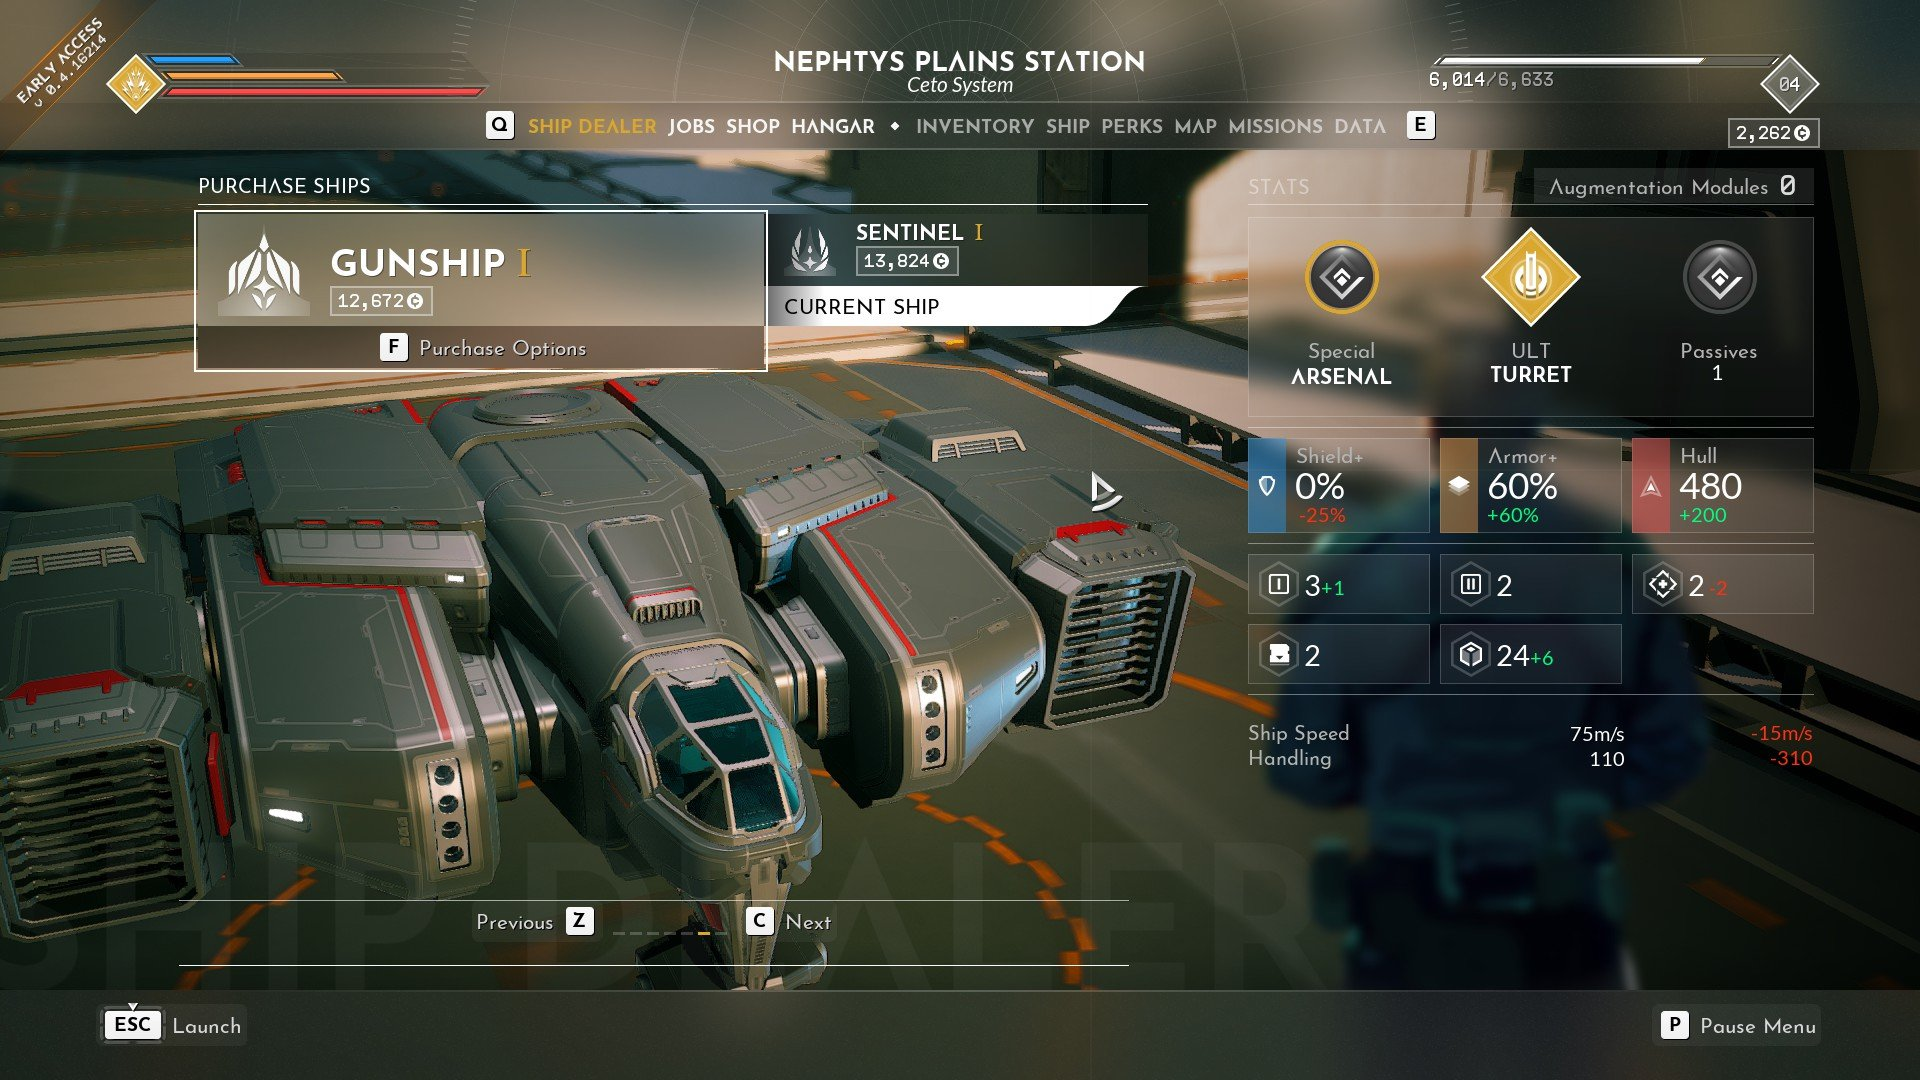 Everspace 2 - Gunship I 1